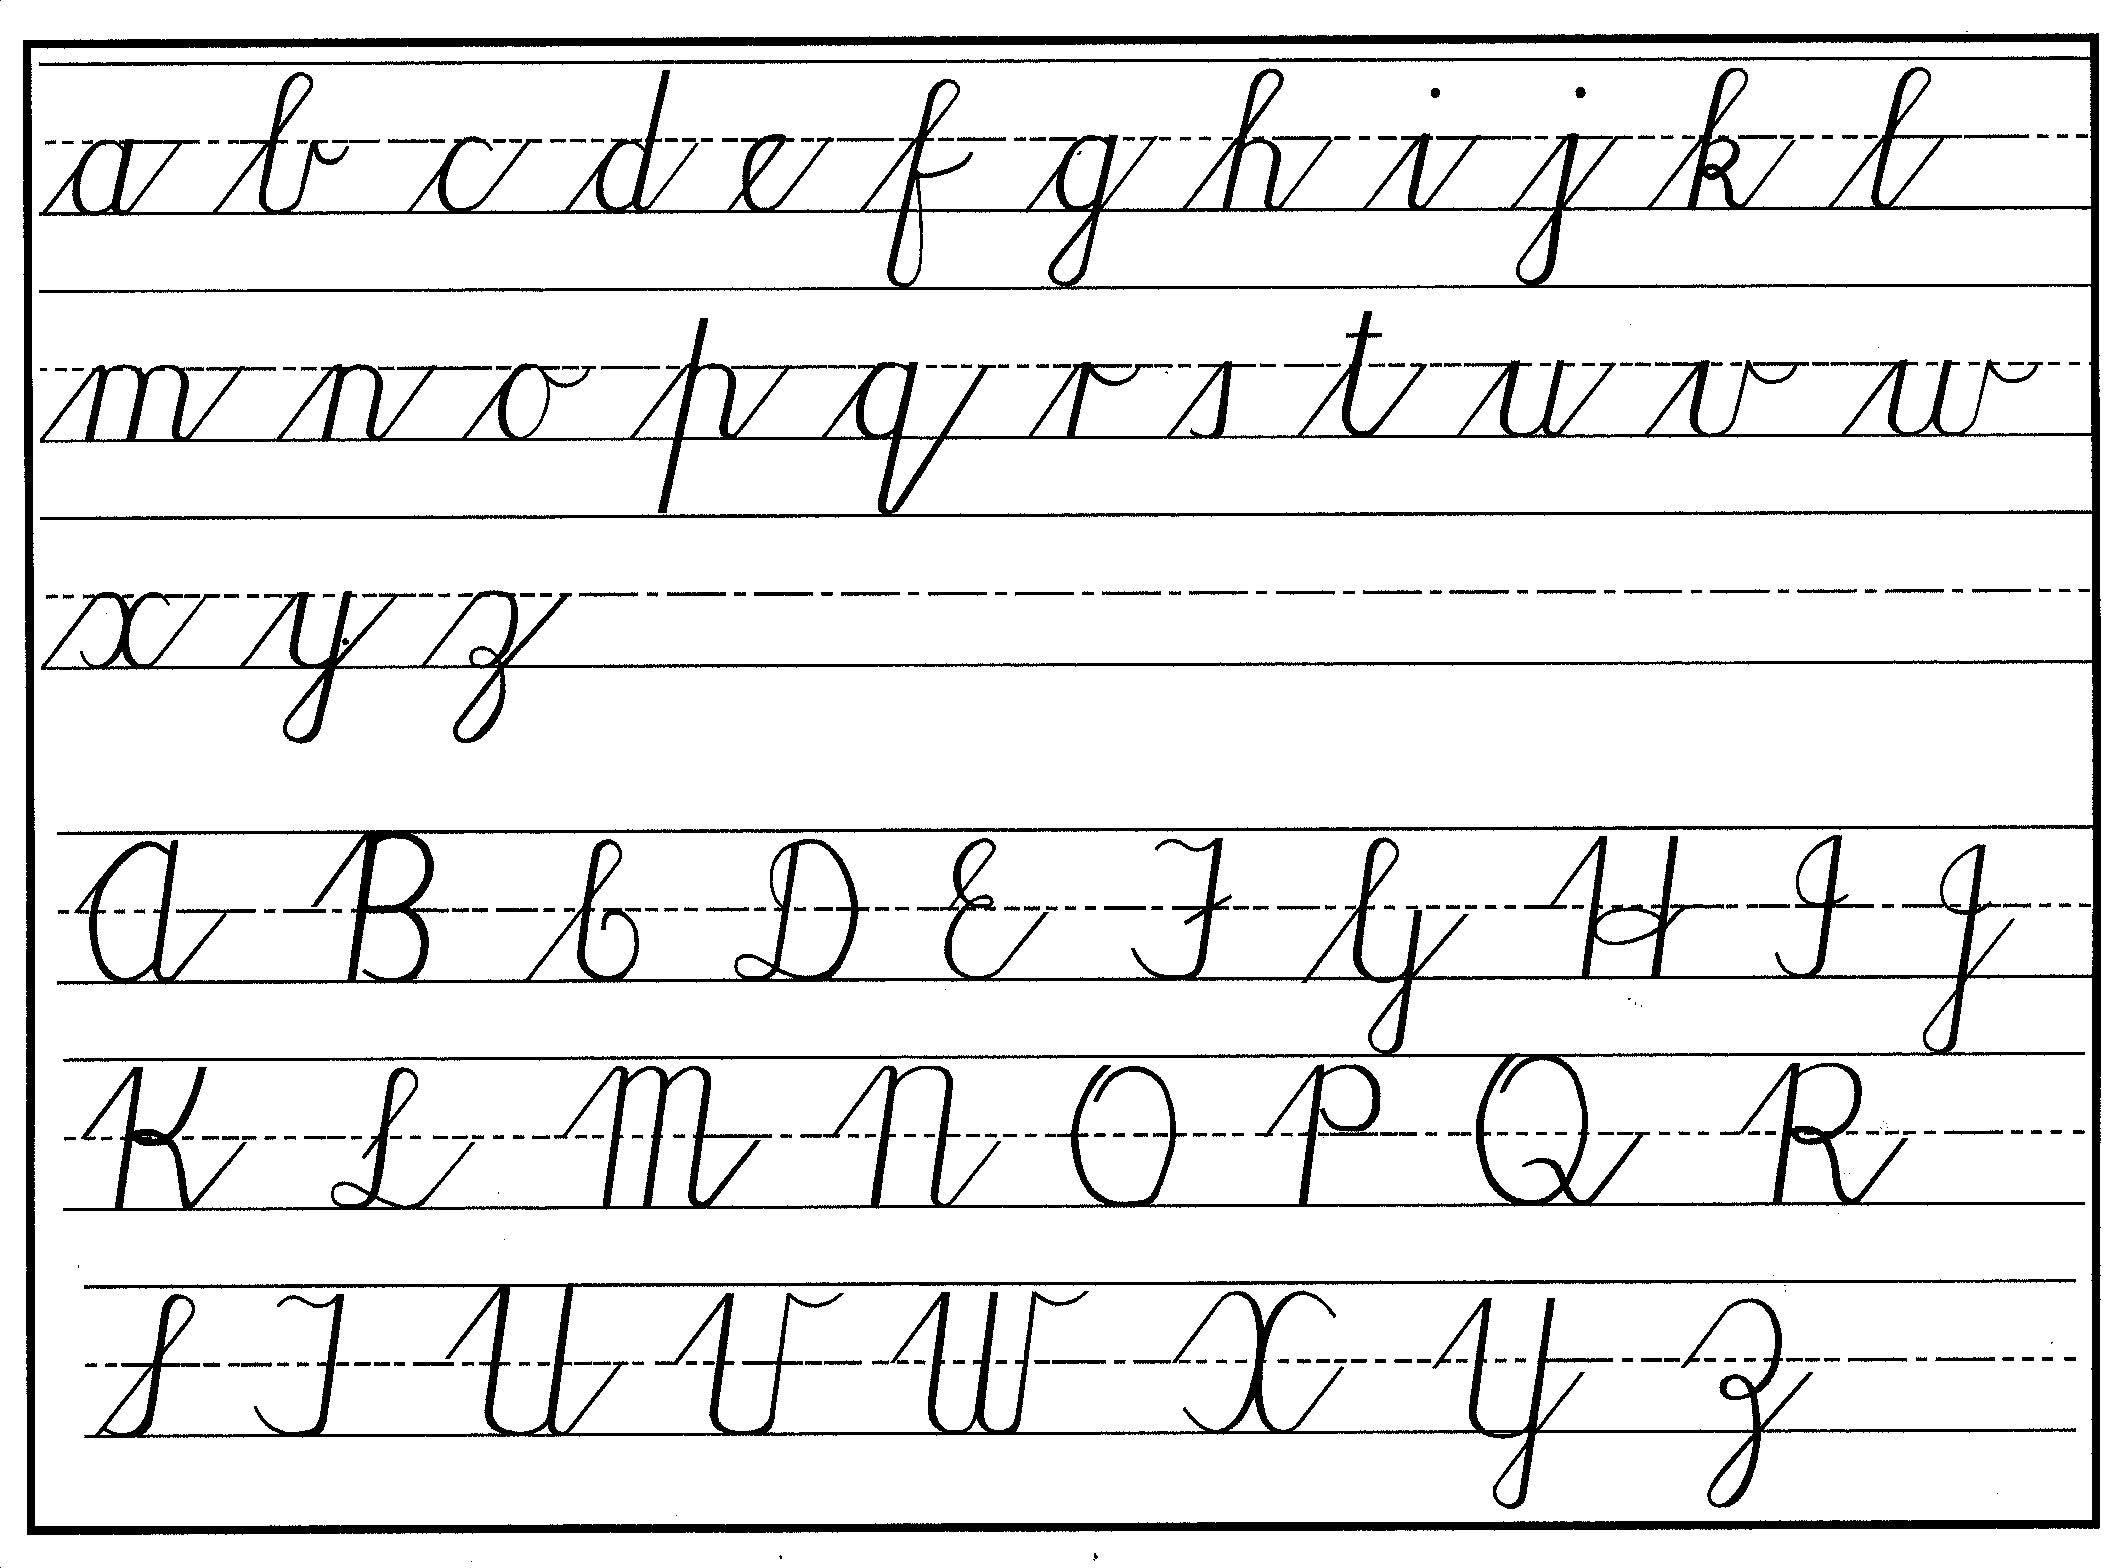 What Does A Cursive Z Look Like - Free Printable Cursive Alphabet